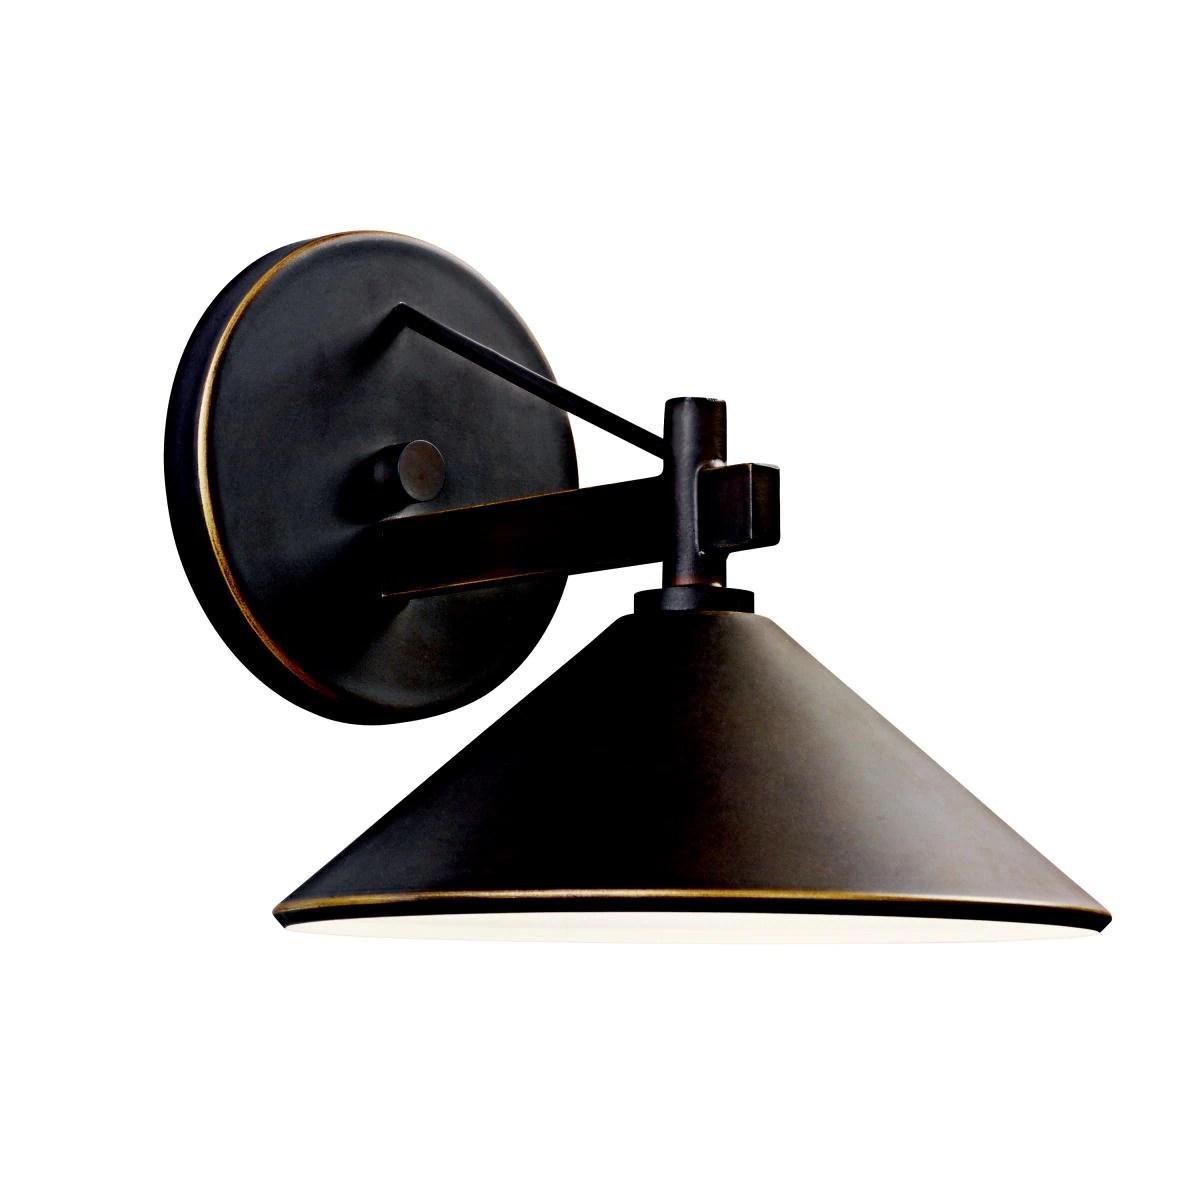 kichler lighting ripley collection 1 light olde bronze indoor outdoor wall sconce